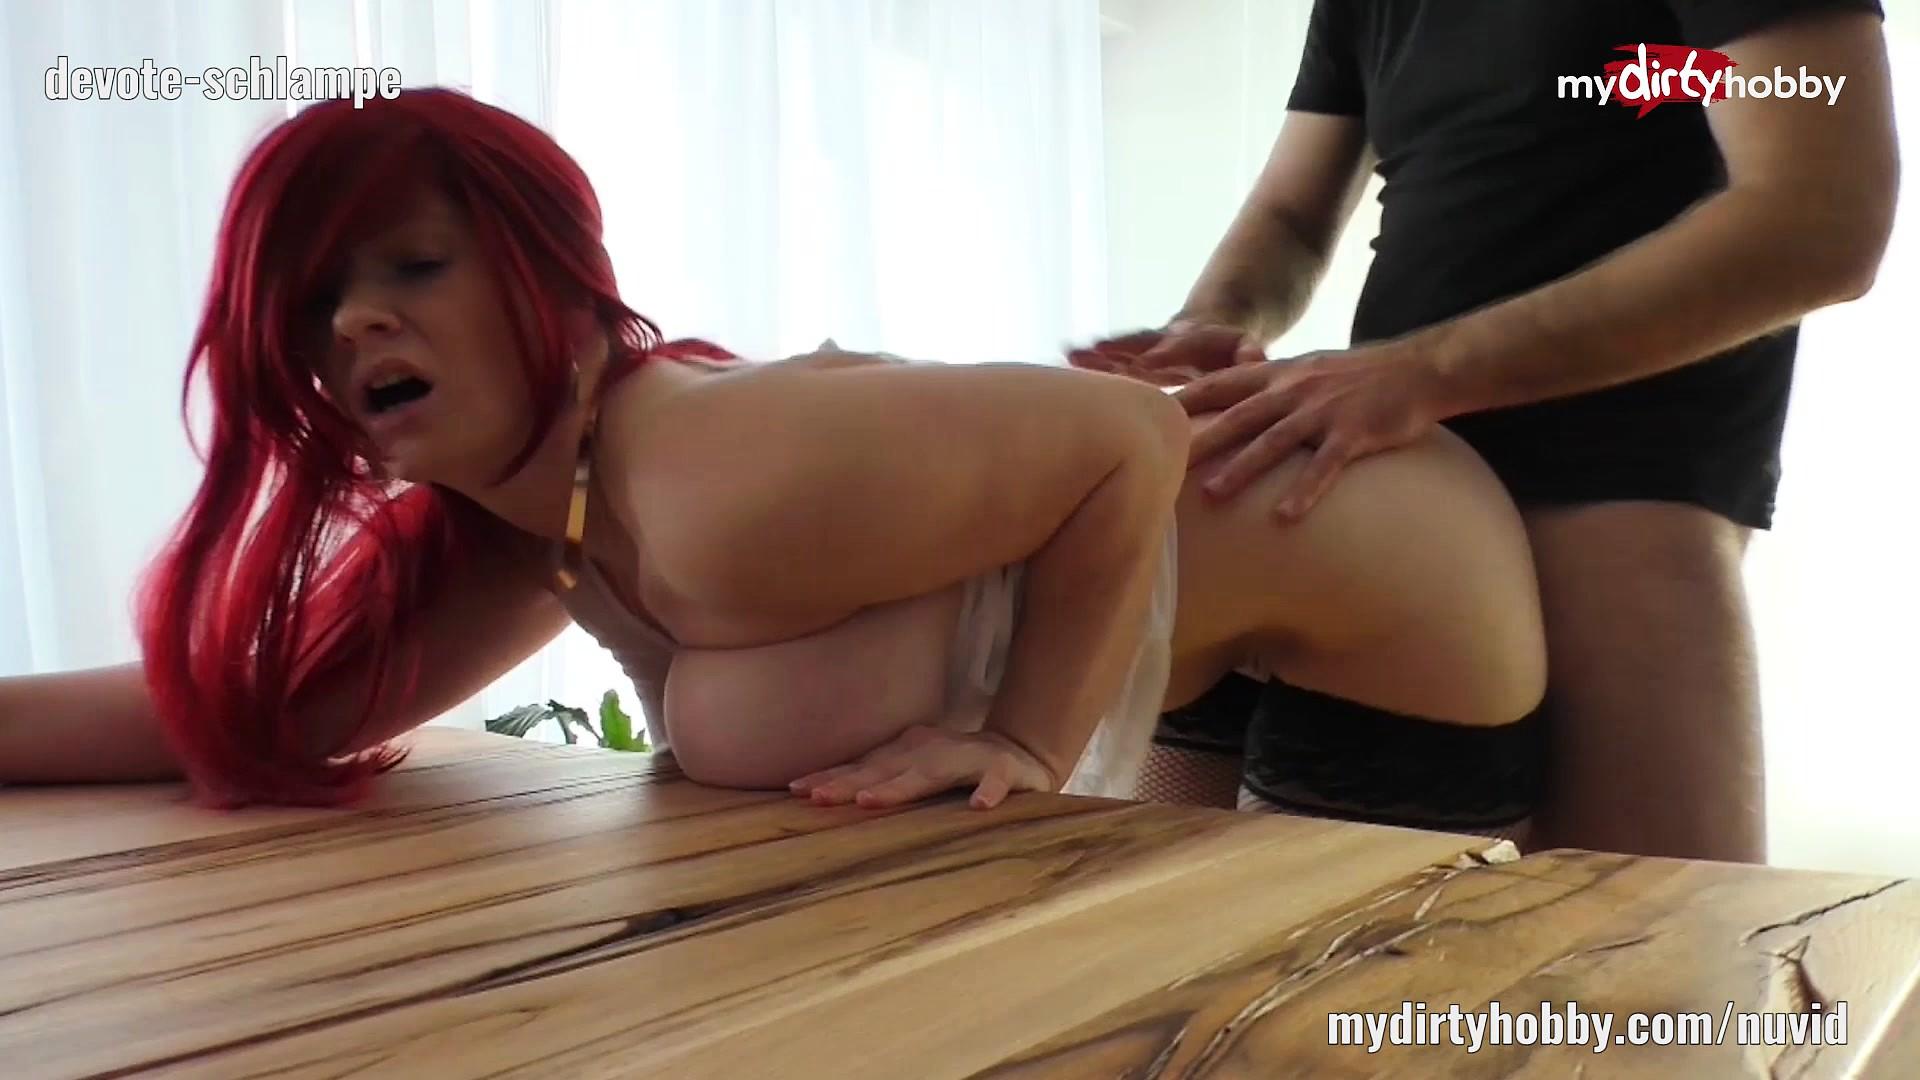 My dirty hobby devote schlampe der fickueberfall sex